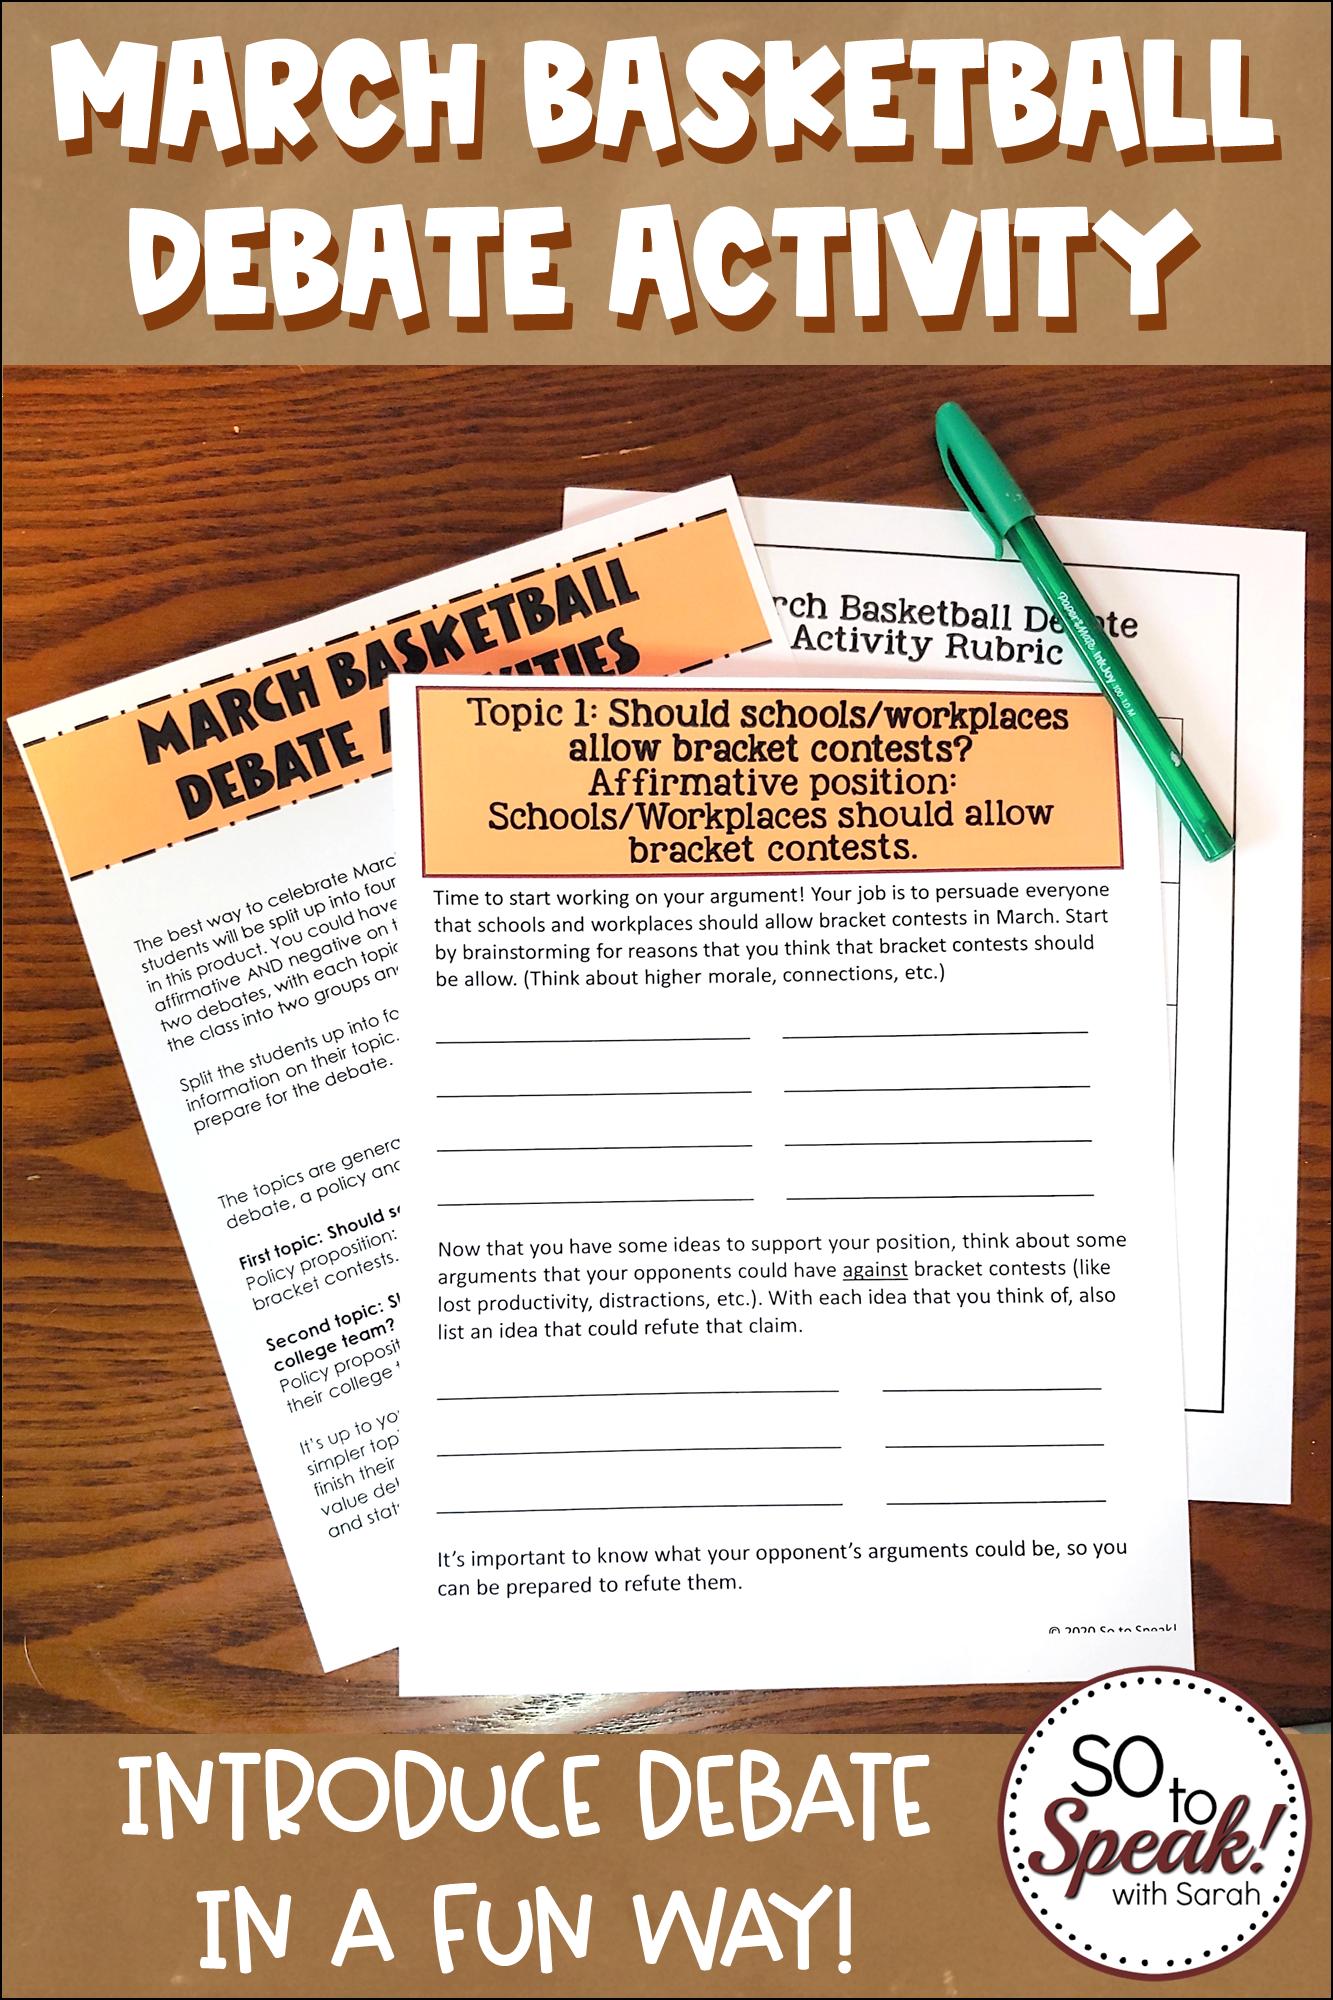 March Basketball Debate Activity